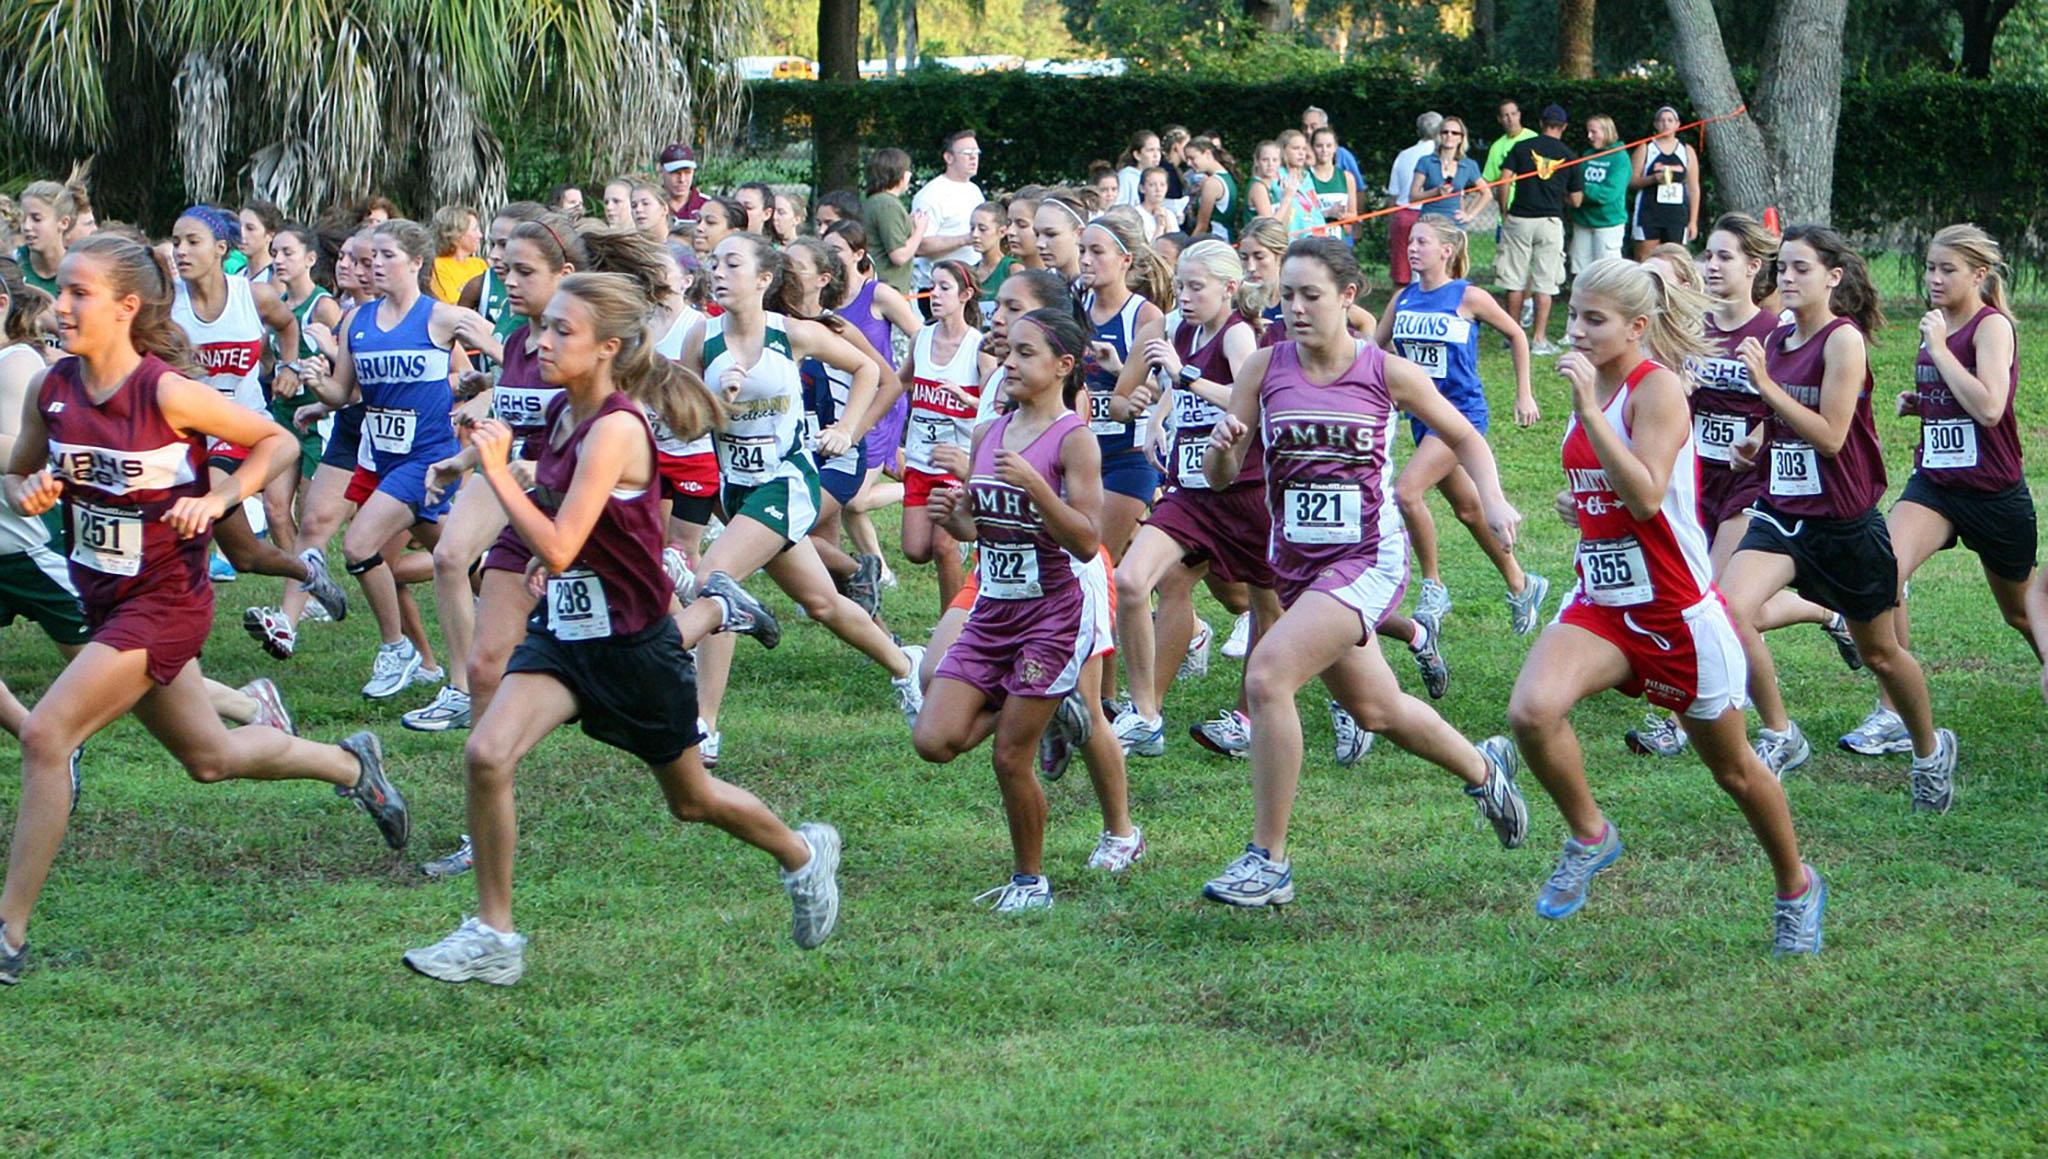 High school girls cross country runners